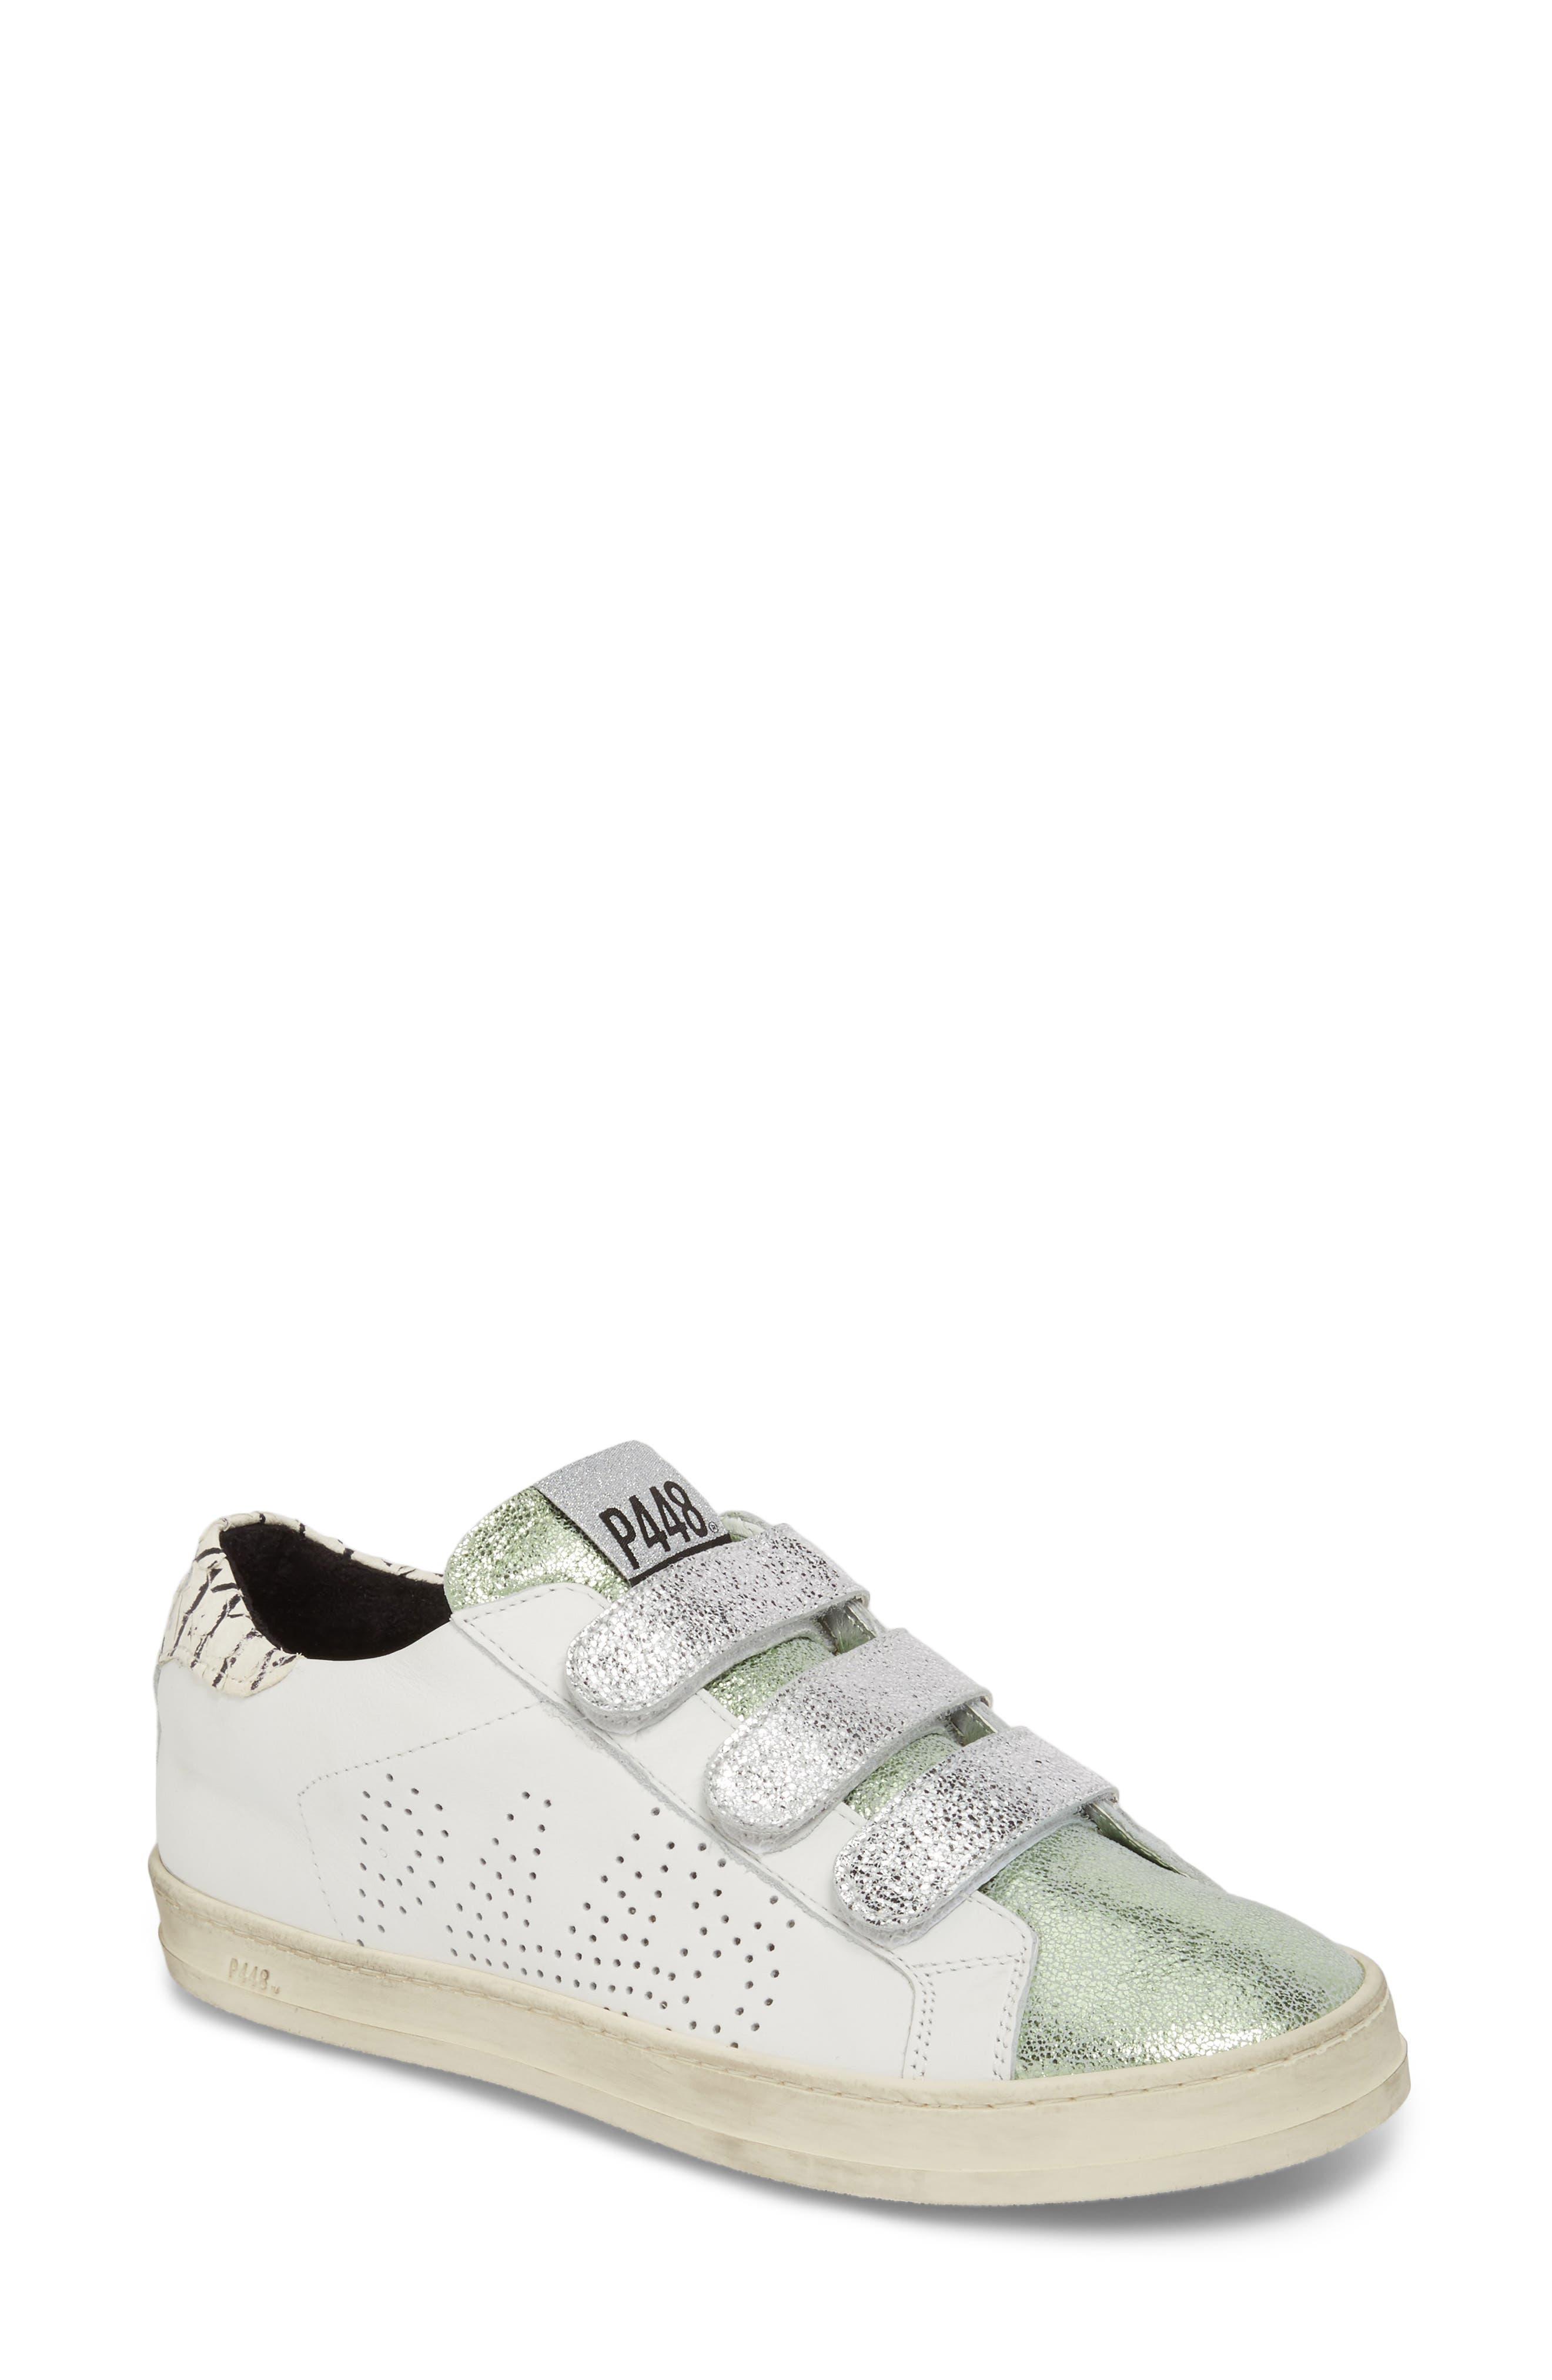 Ralph Sneaker,                             Main thumbnail 1, color,                             Green